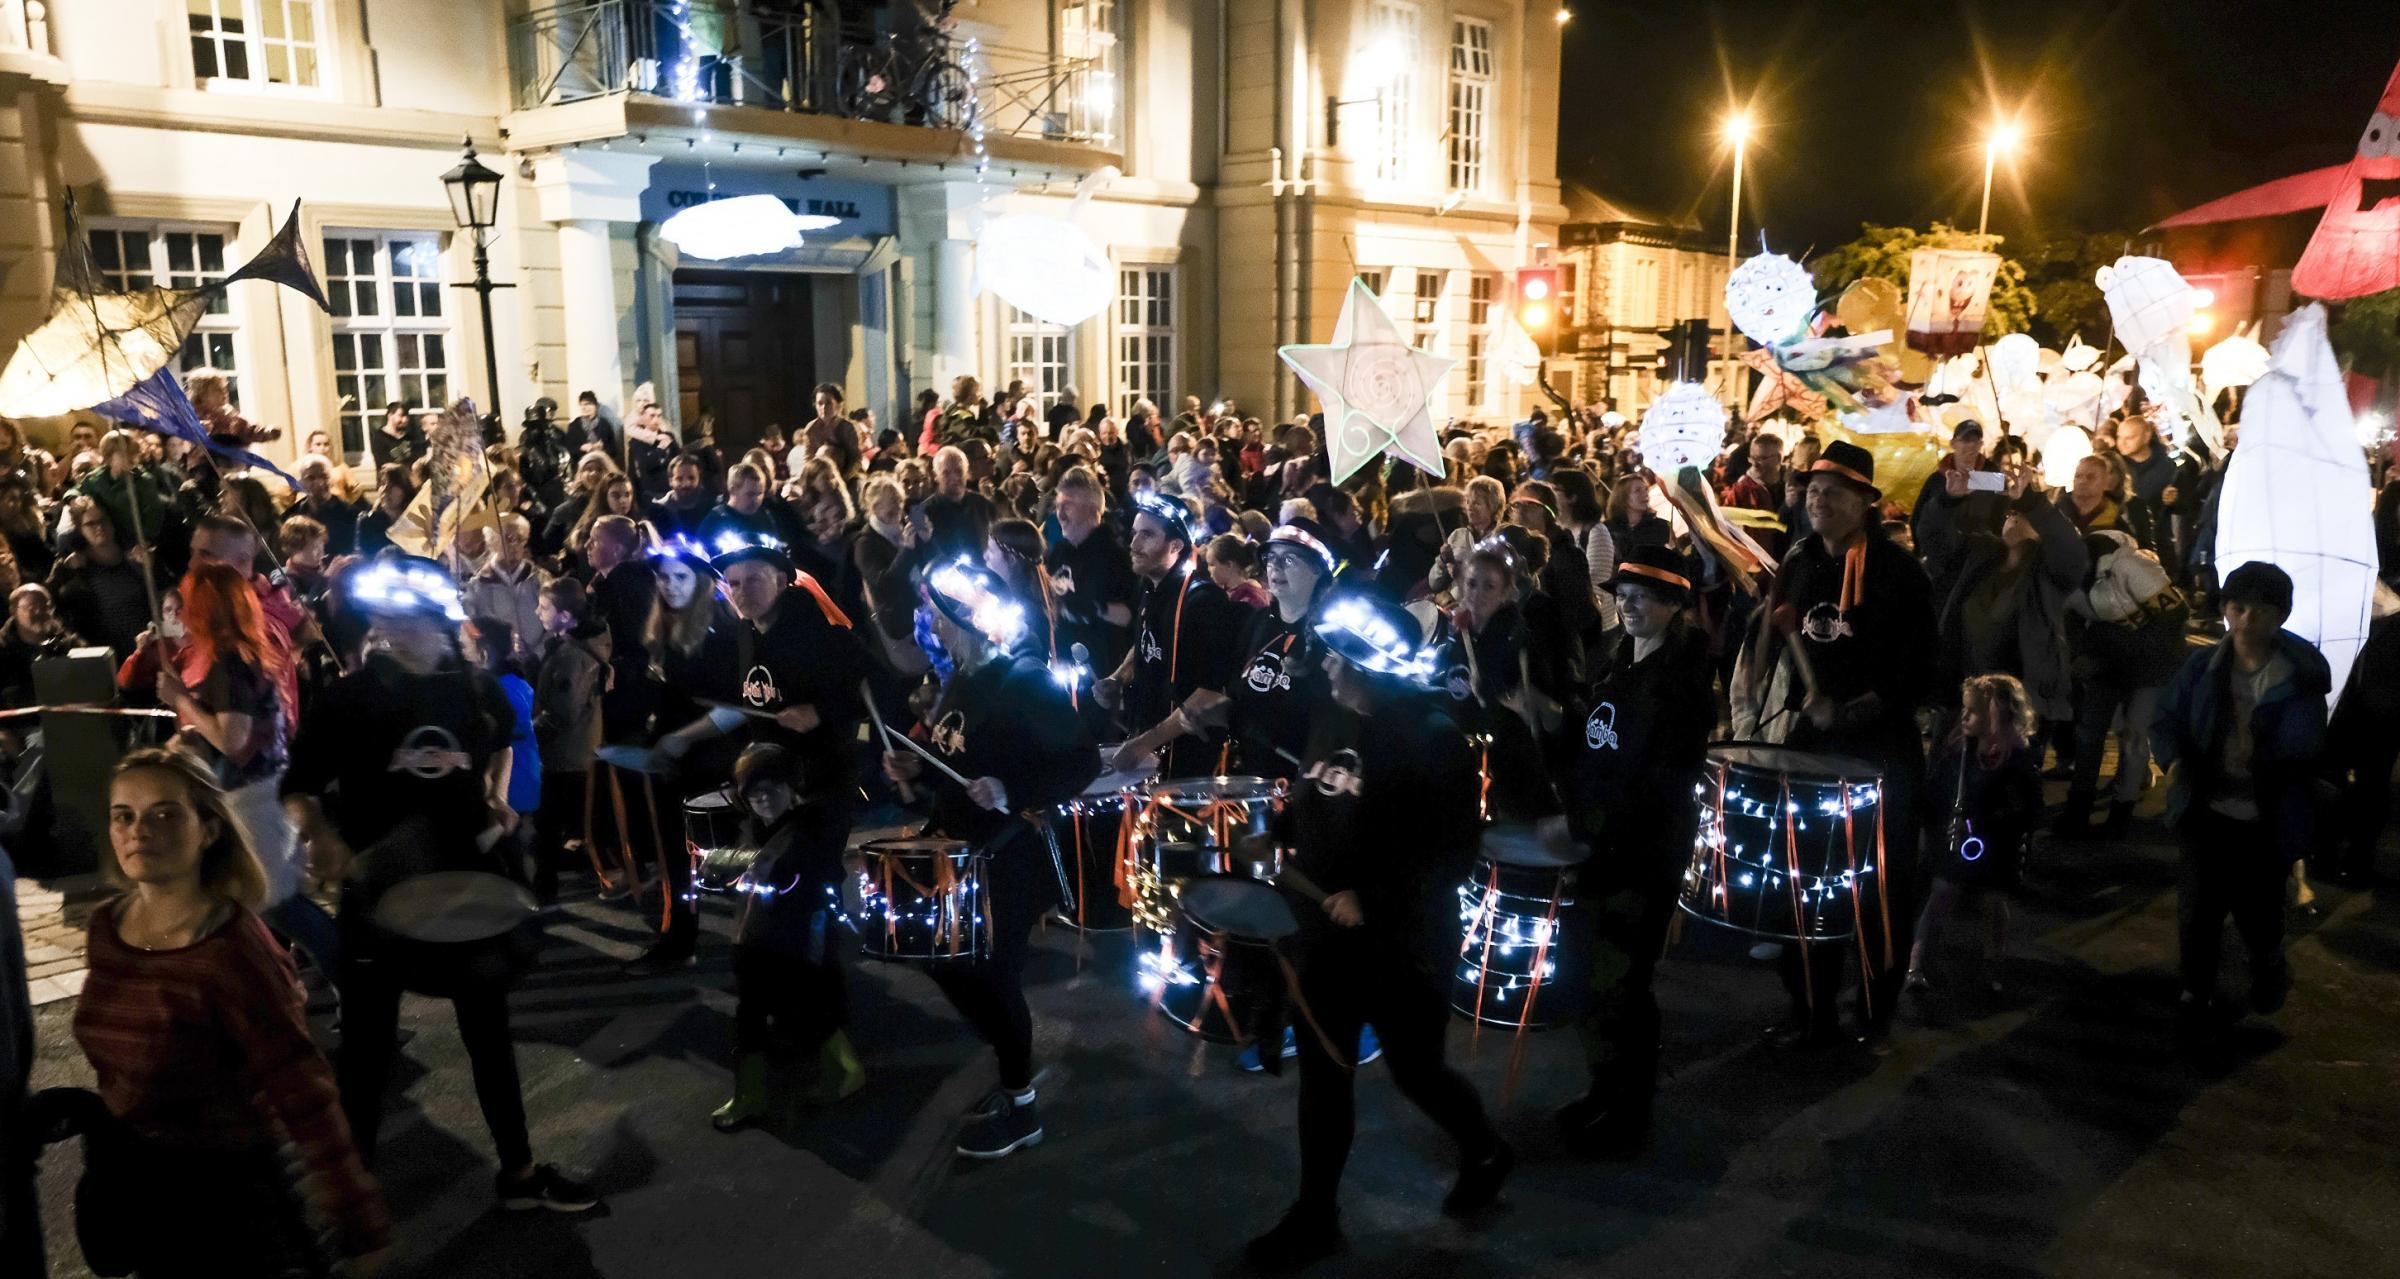 Ulverston Lantern Festival may go virtual due to coronavirus